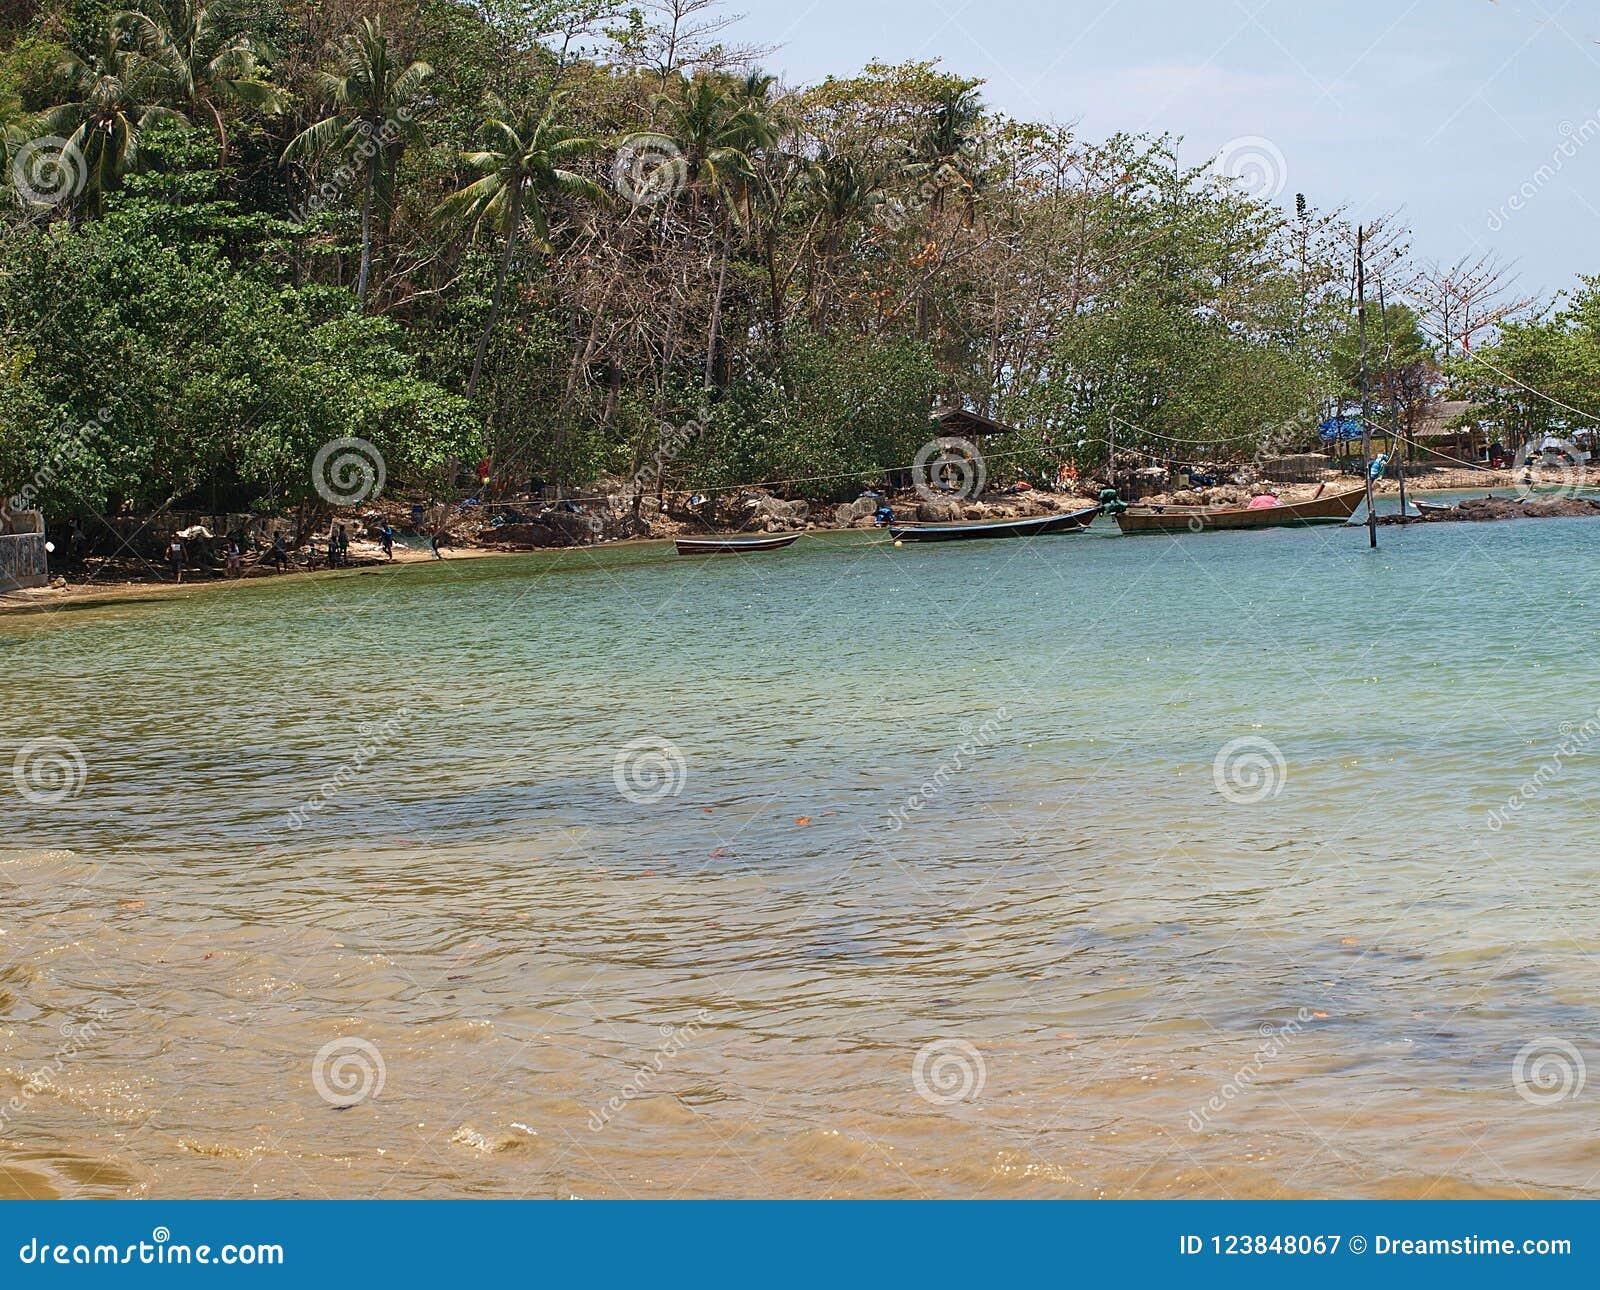 Fishing Boats On The Tropical Island Of Koh Lanta Thailand